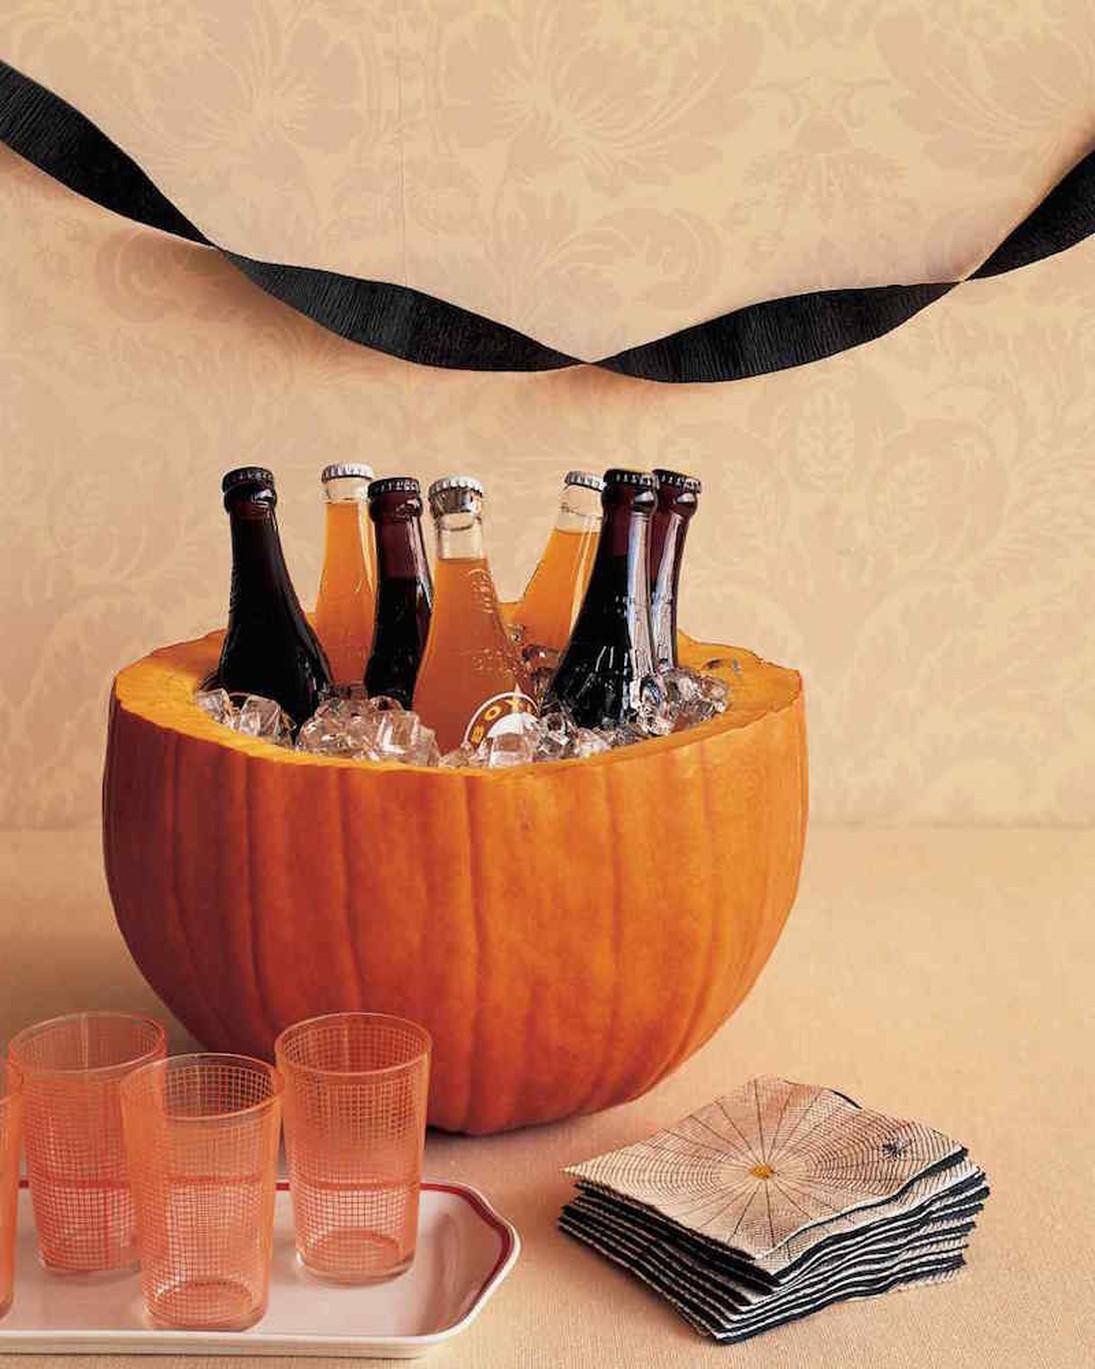 decoración de Halloween casera para bebidas